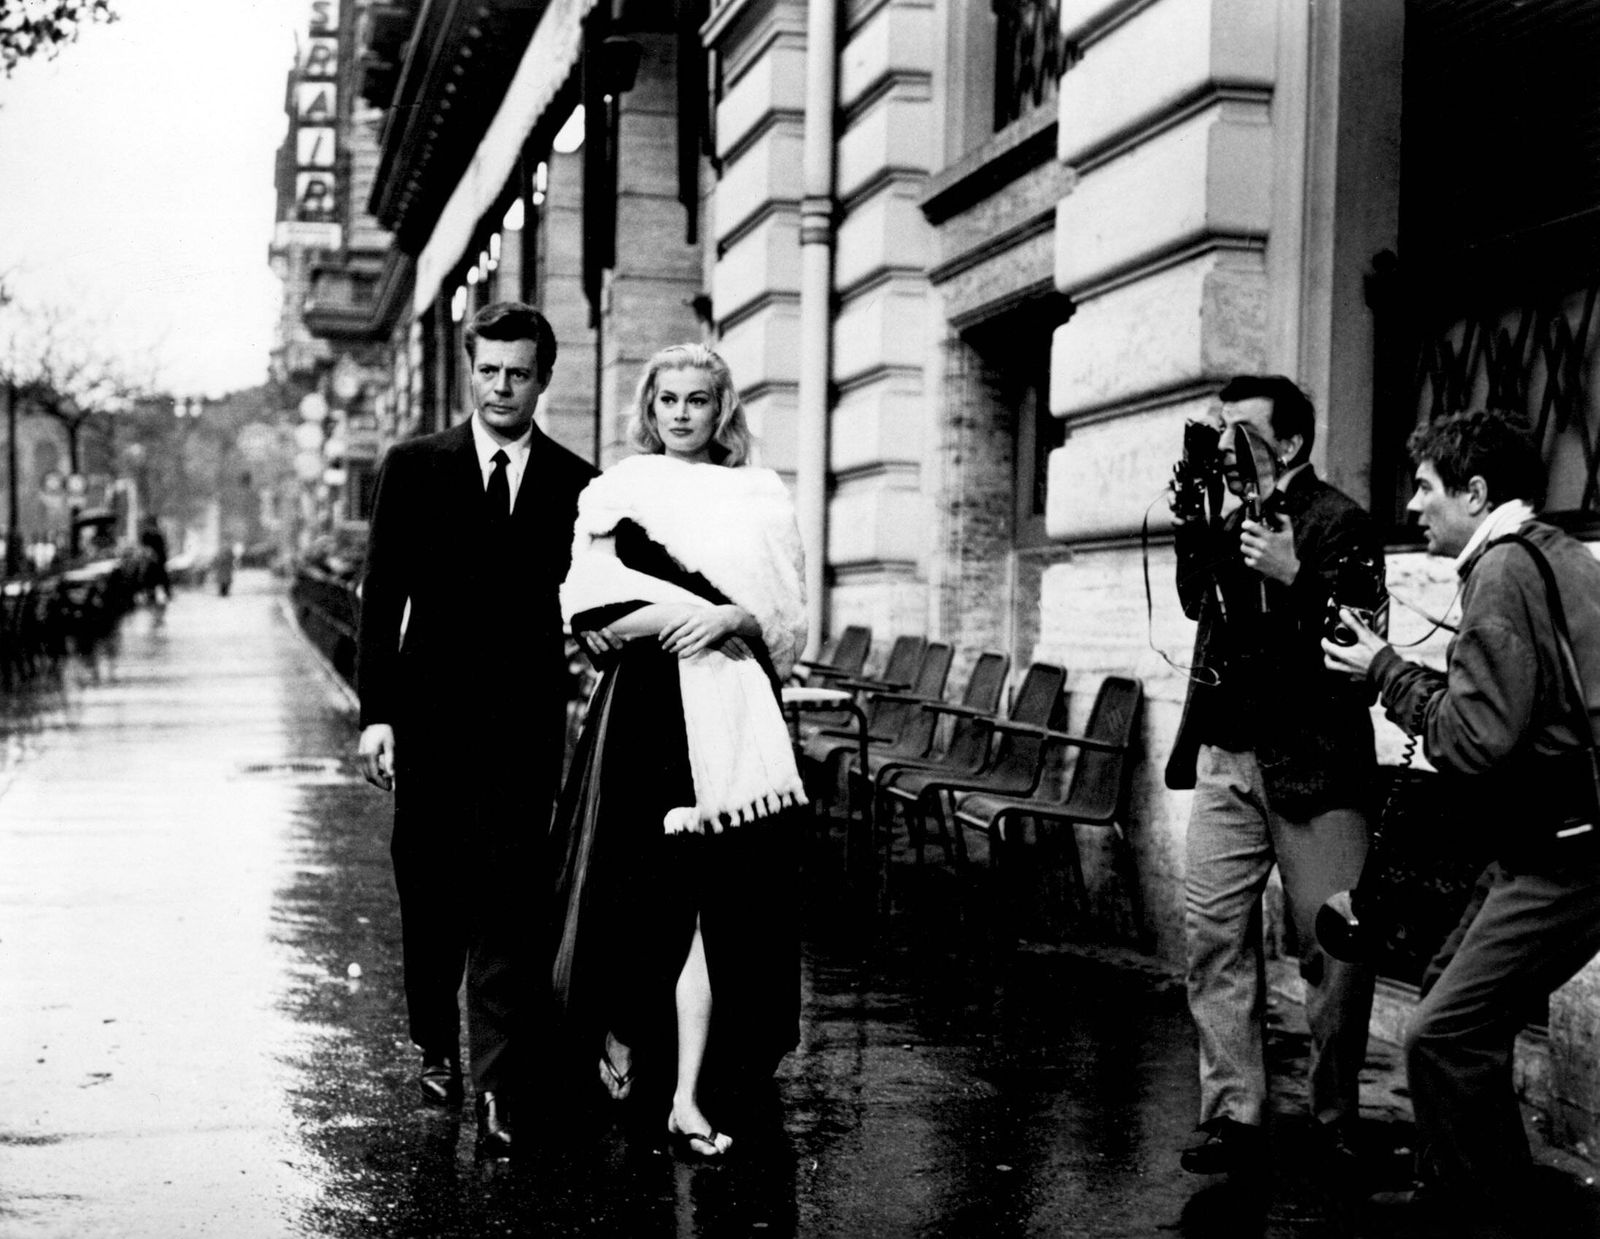 LA DOLCE VITA, Marcello Mastroianni, Anita Ekberg, 1960 Courtesy Everett Collection !ACHTUNG AUFNAHMEDATUM GESCHÄTZT! PU